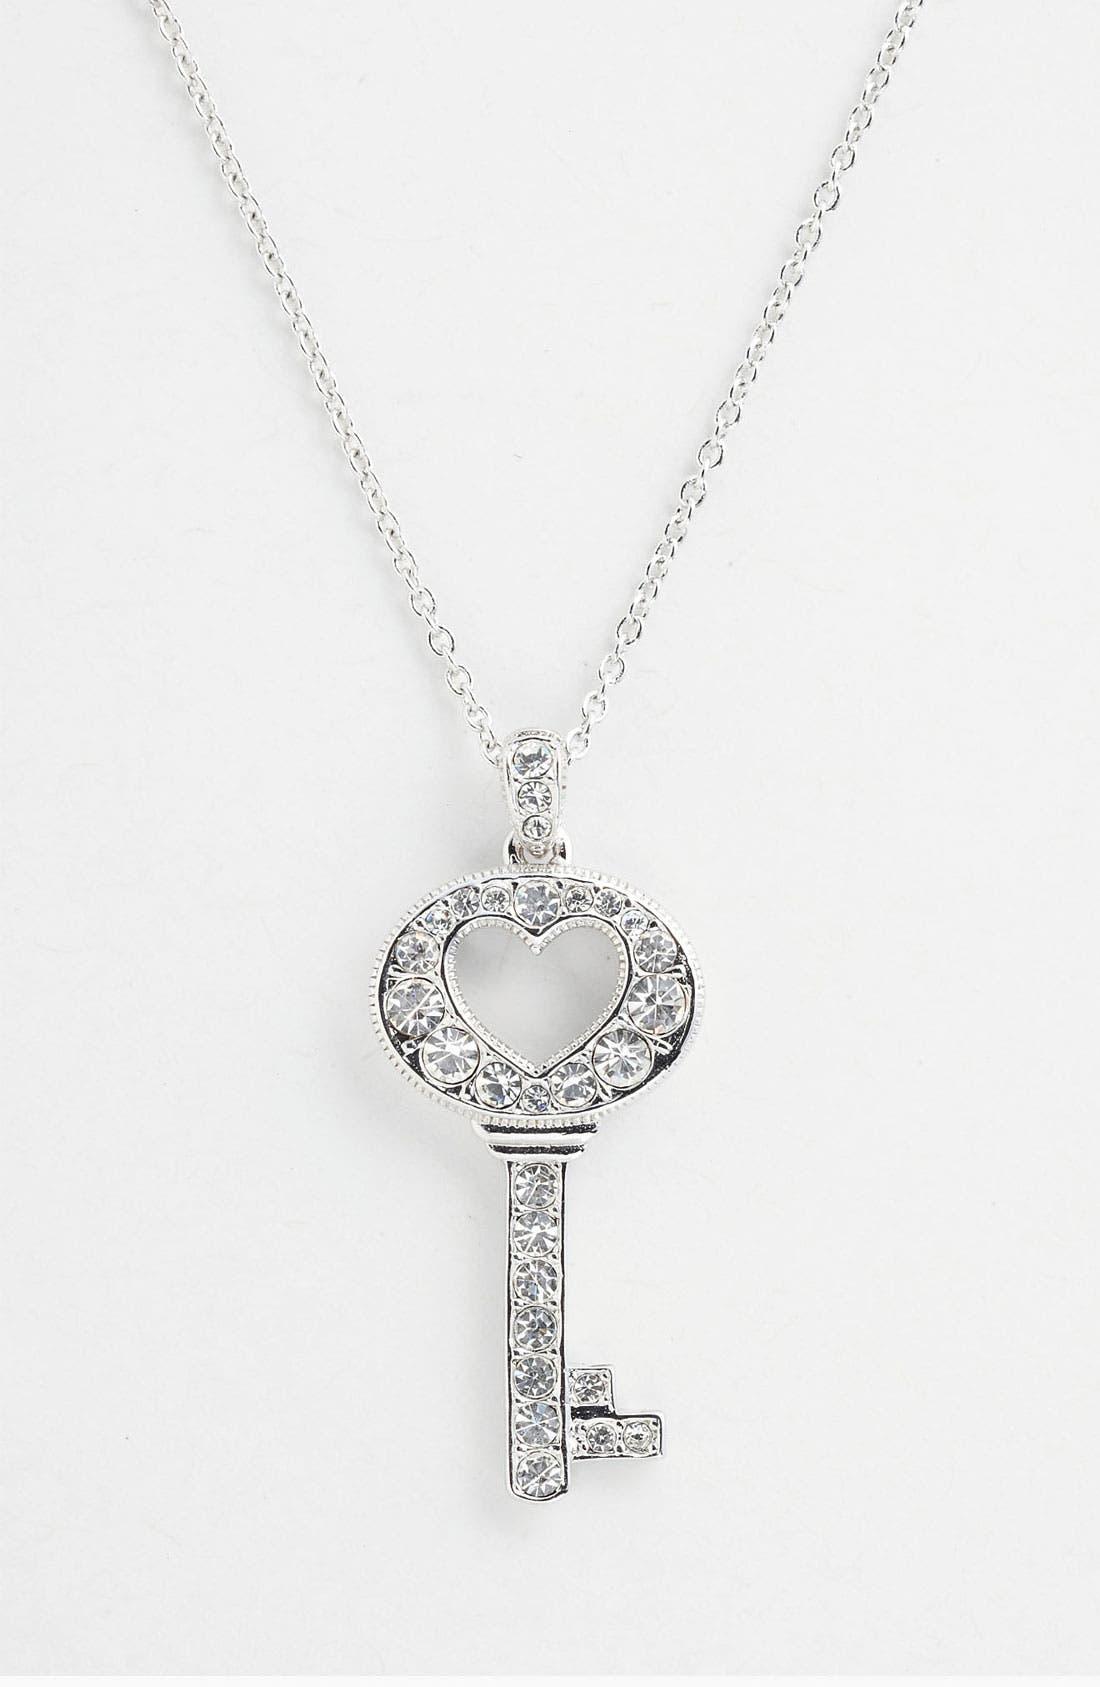 Main Image - Nadri Boxed Key Pendant Necklace (Nordstrom Exclusive)